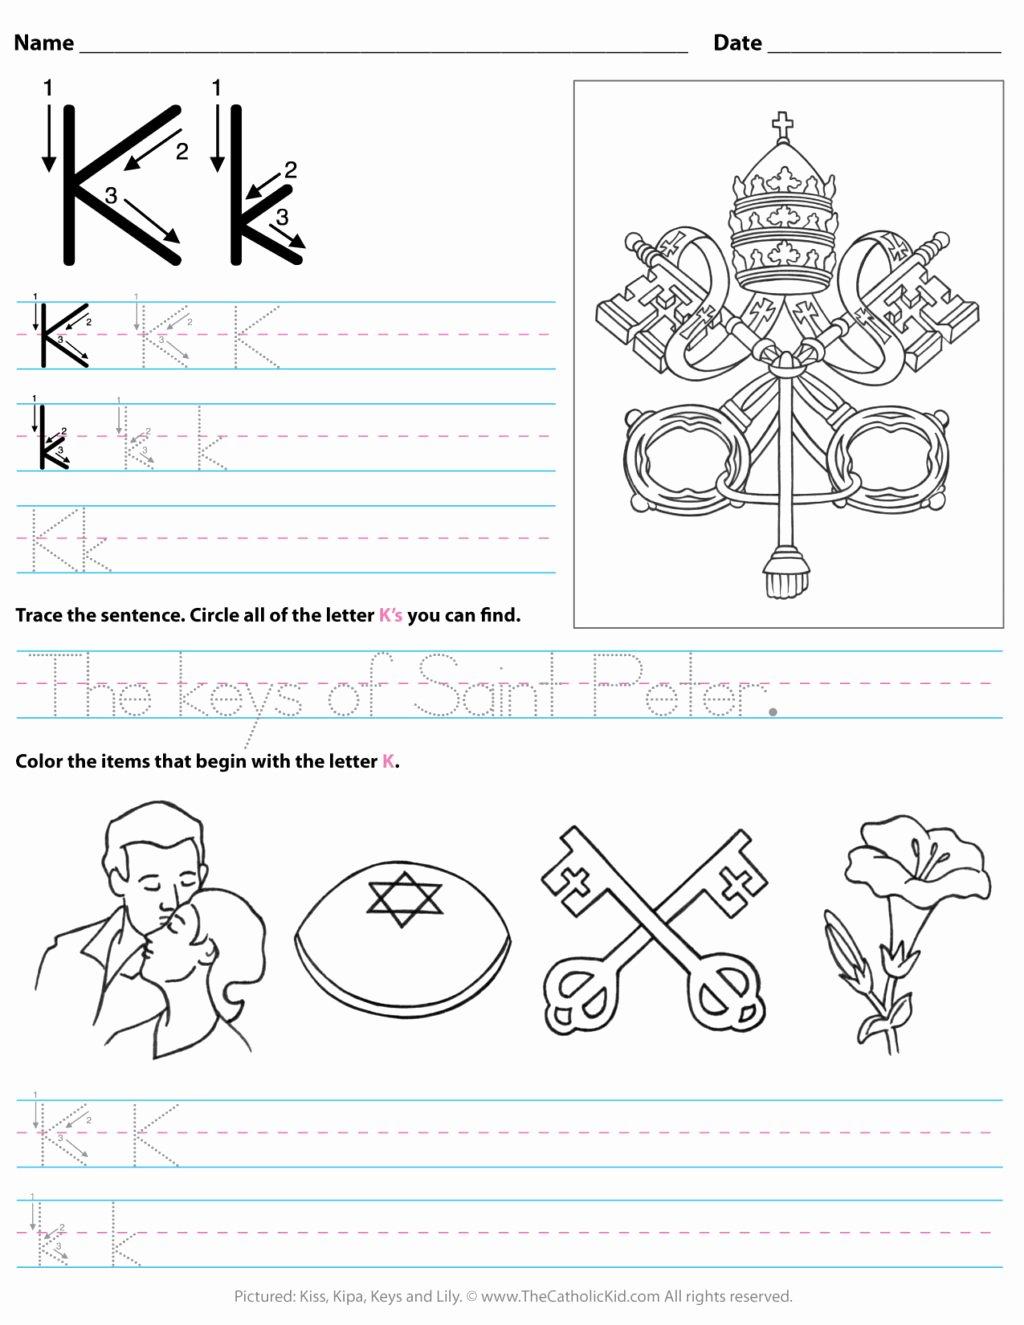 The Letter K Worksheets for Preschoolers top Worksheet Freets for toddlers Printable K Preschool Letter